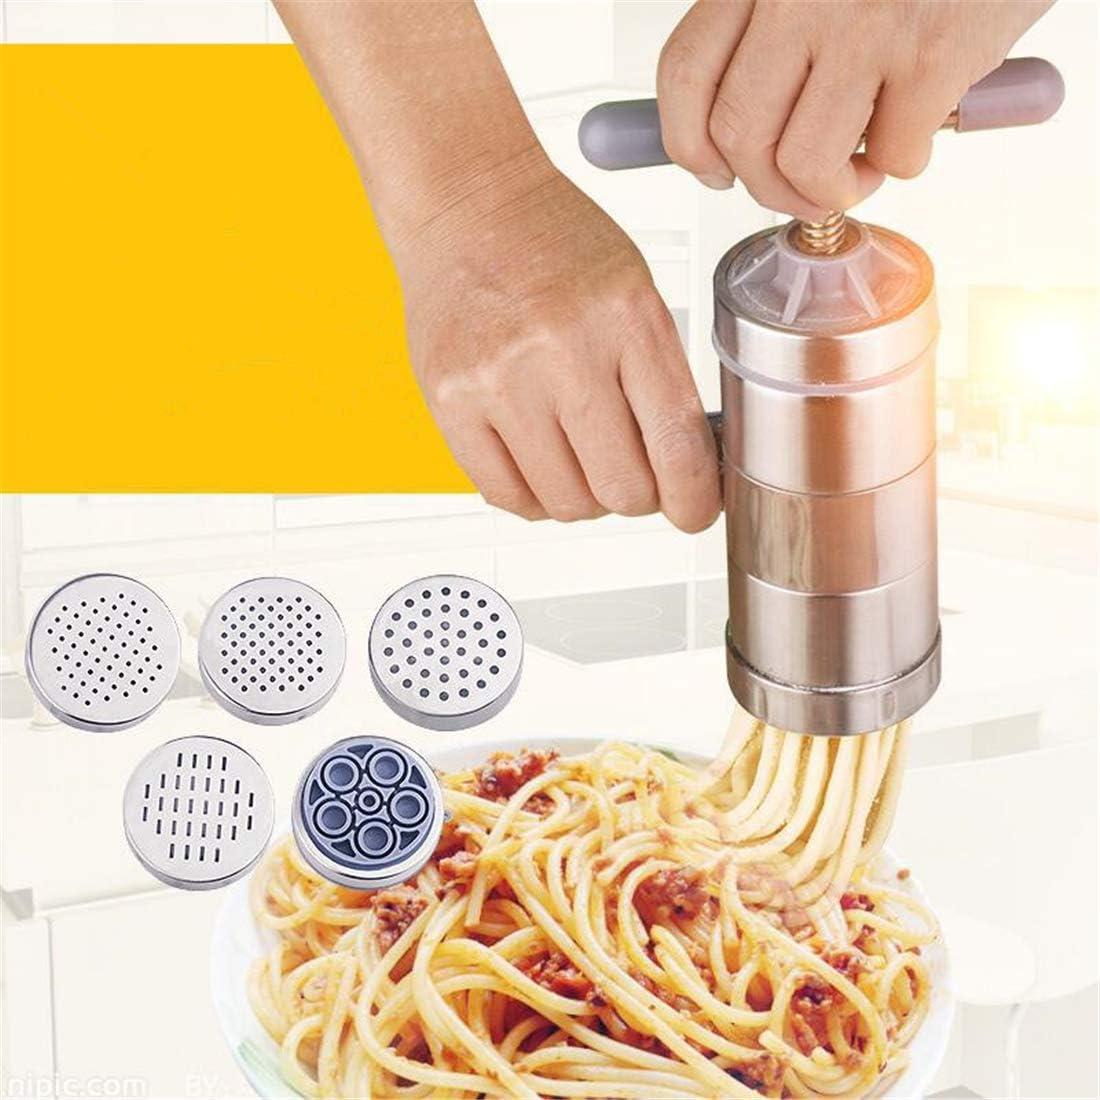 #1 HoJoor M/áquina para Hacer Pasta Fresca Prensador Acero Inoxidable Noodle Maker Vegetal Pur/é de Papas Fruta Exprimidor Prensa Fideos de M/áquina Herramienta de Cocina 5 x Molde